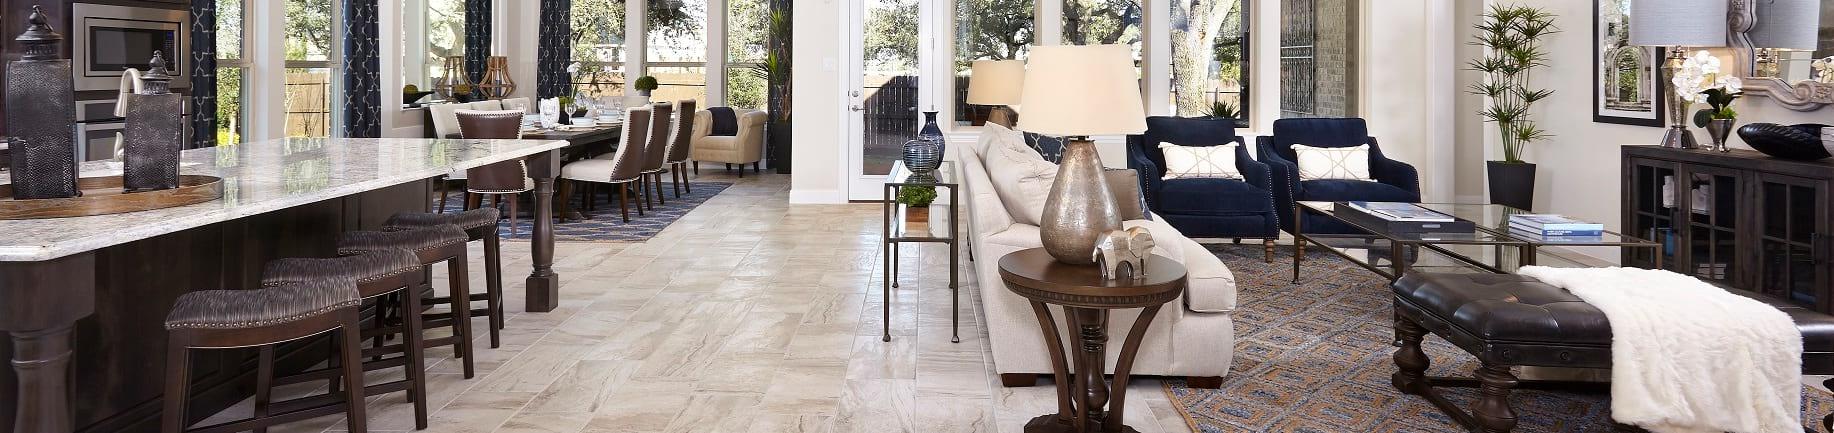 Gehan Homes - Design Center | AZ & TX New Home Builder